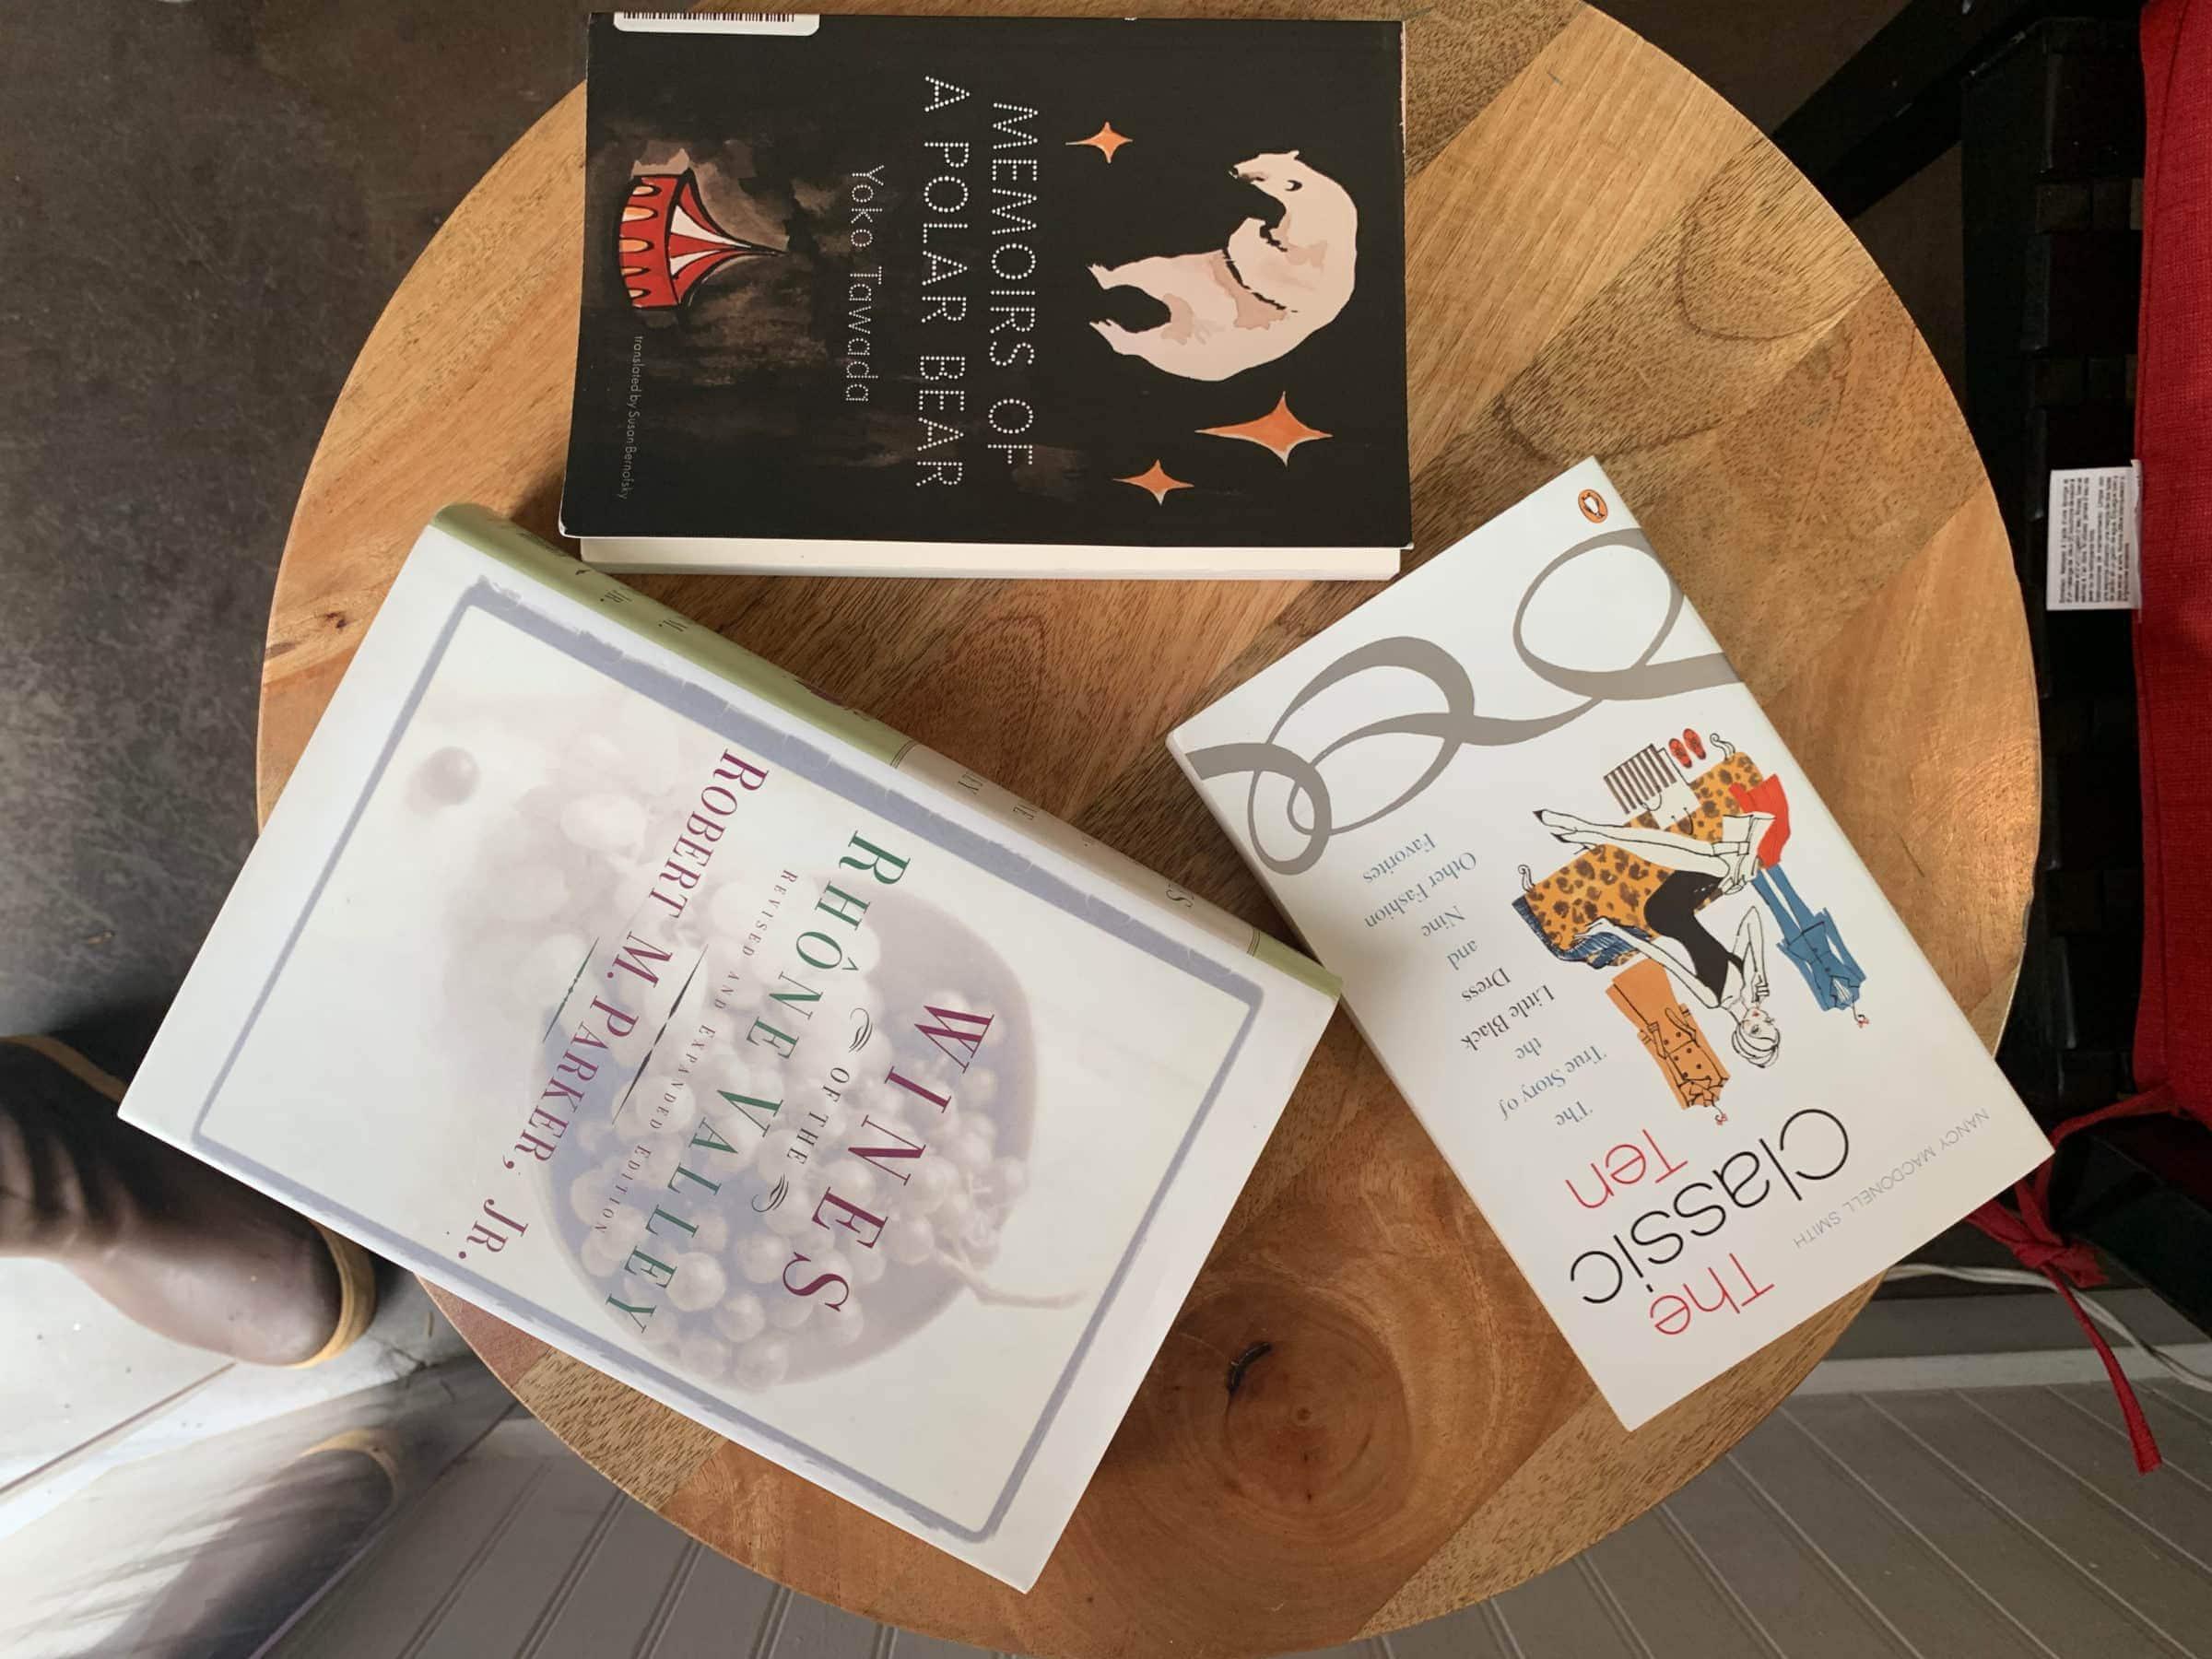 Books at Equinox